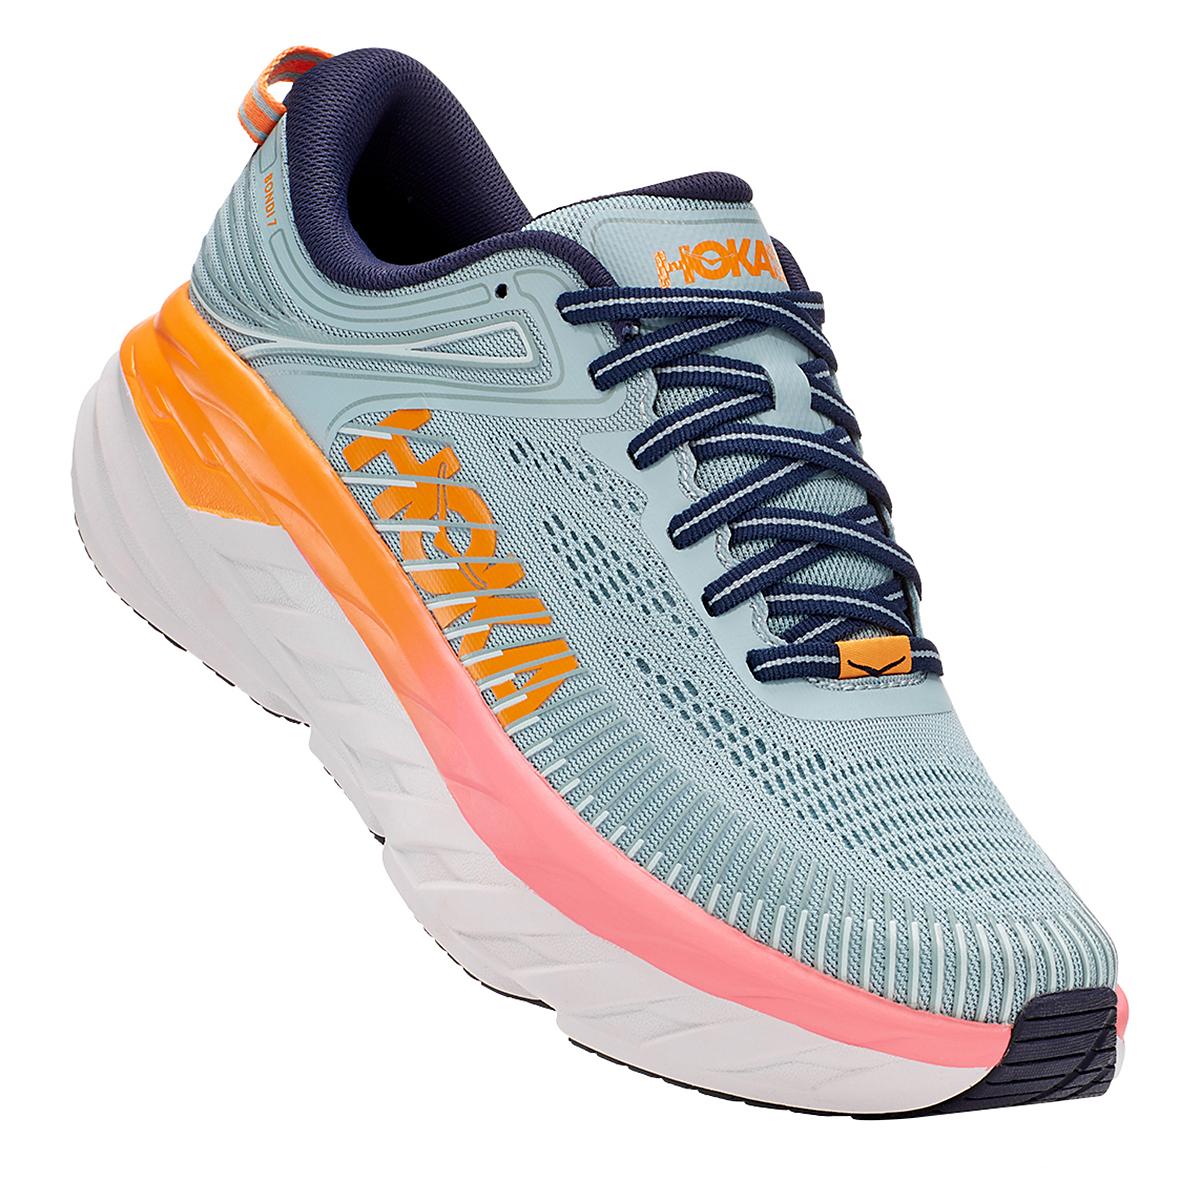 Women's Hoka One One Bondi 7 Running Shoe - Color: Blue Haze/Black Iris - Size: 5.5 - Width: Regular, Blue Haze/Black Iris, large, image 3